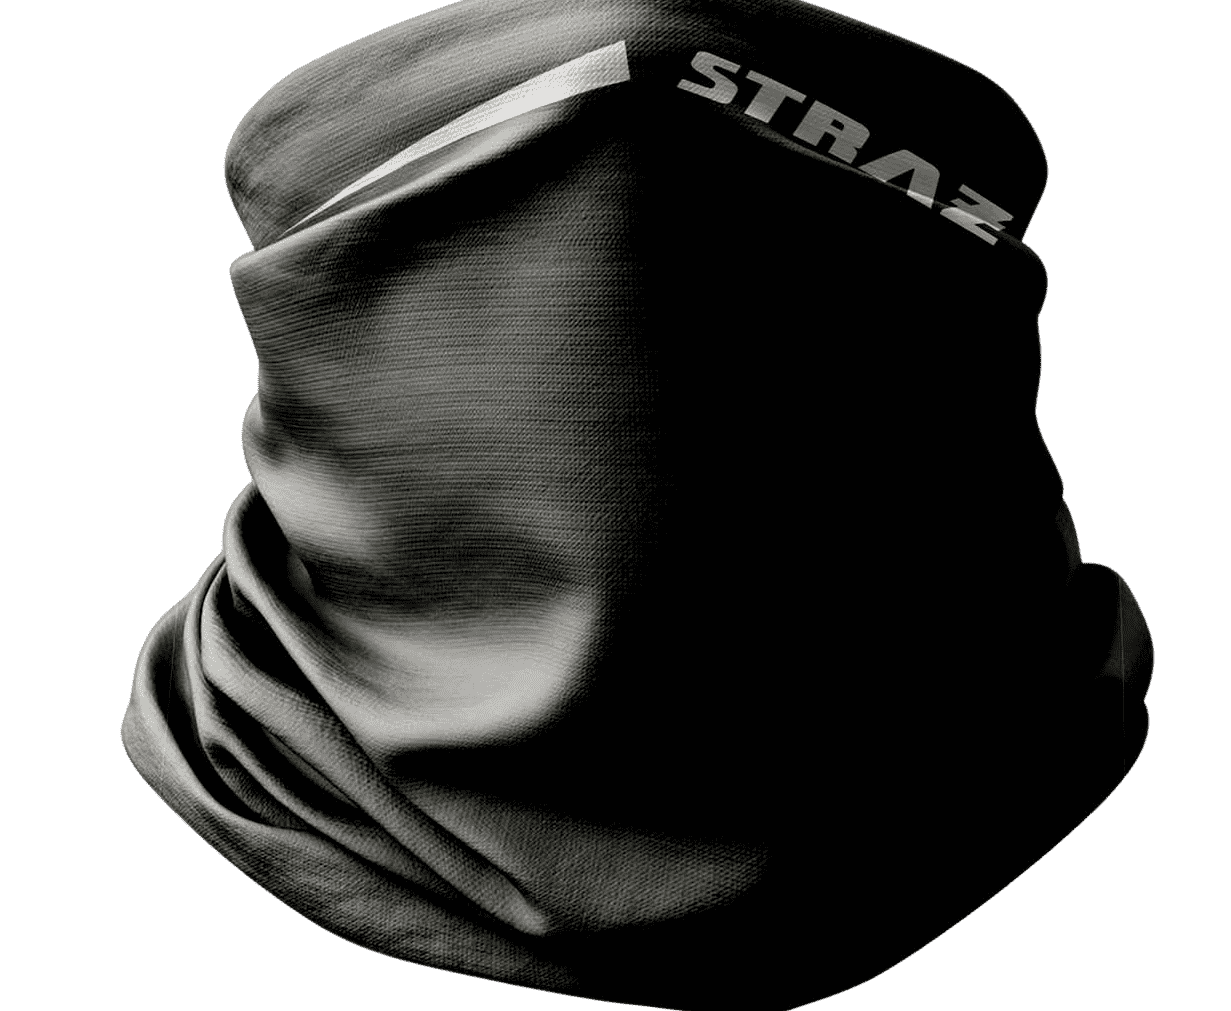 buff strefa998